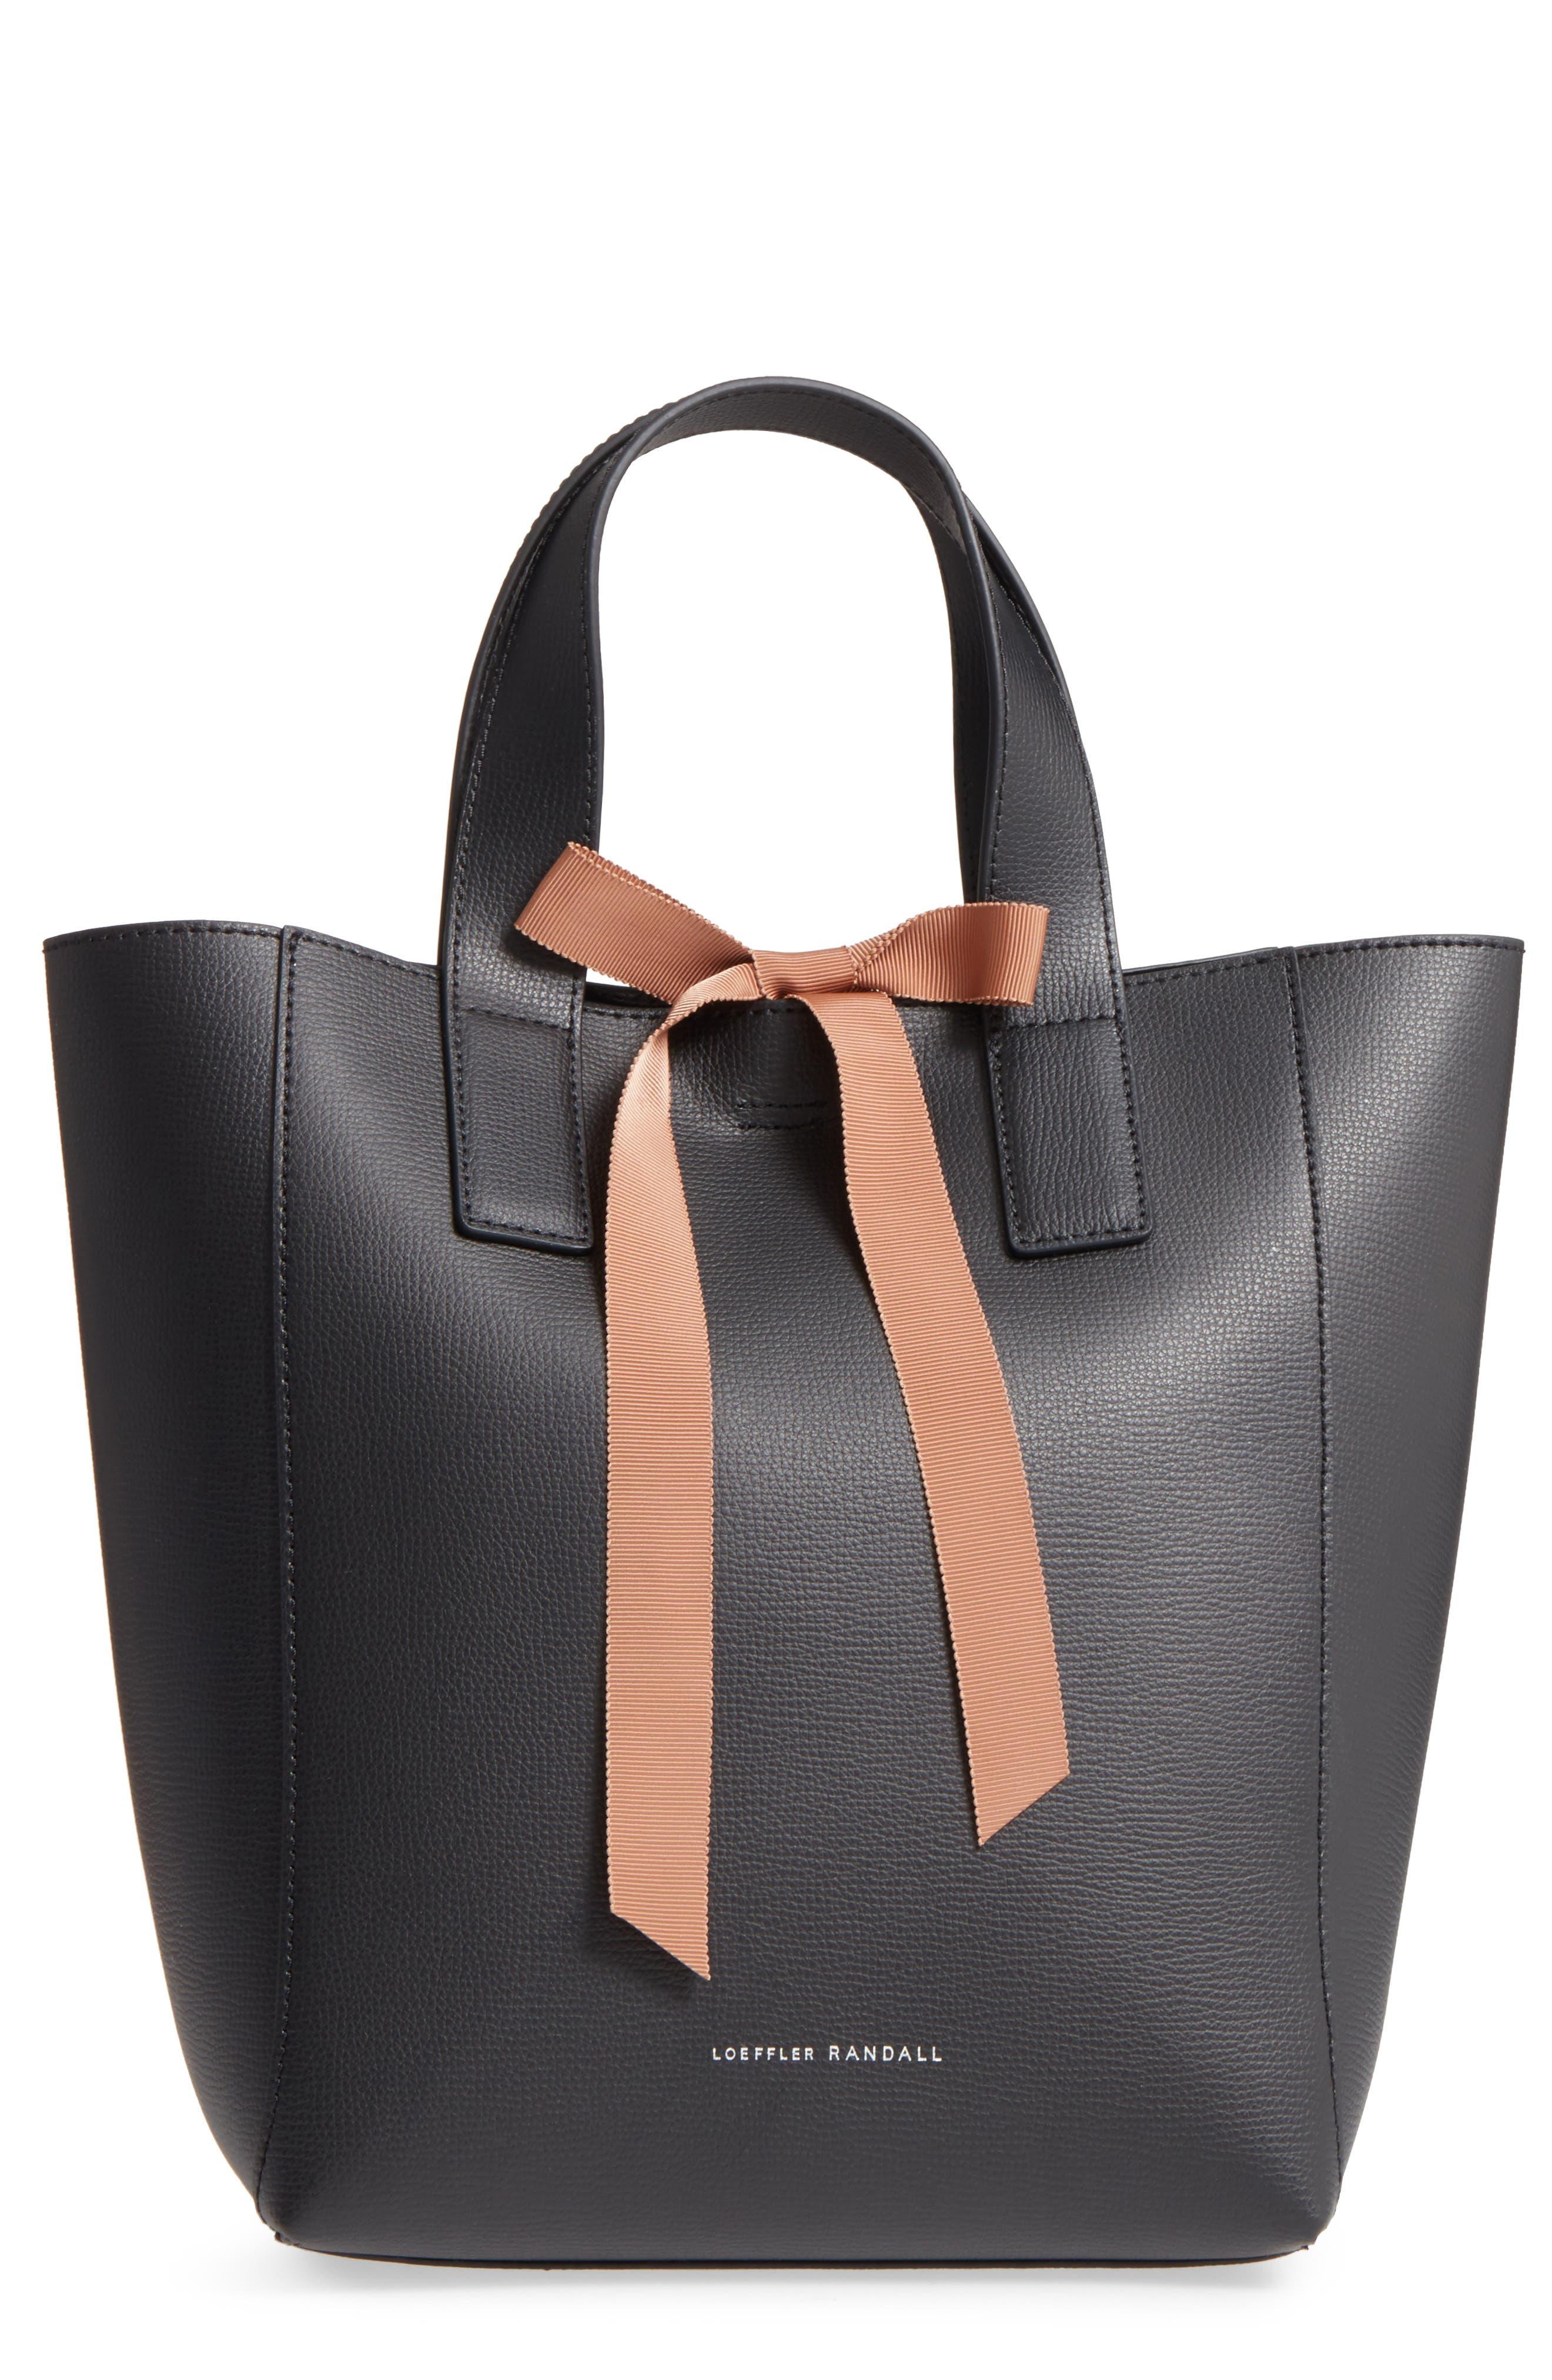 Main Image - Loeffler Randall Ribbon Tie Leather Top Handle Shopper